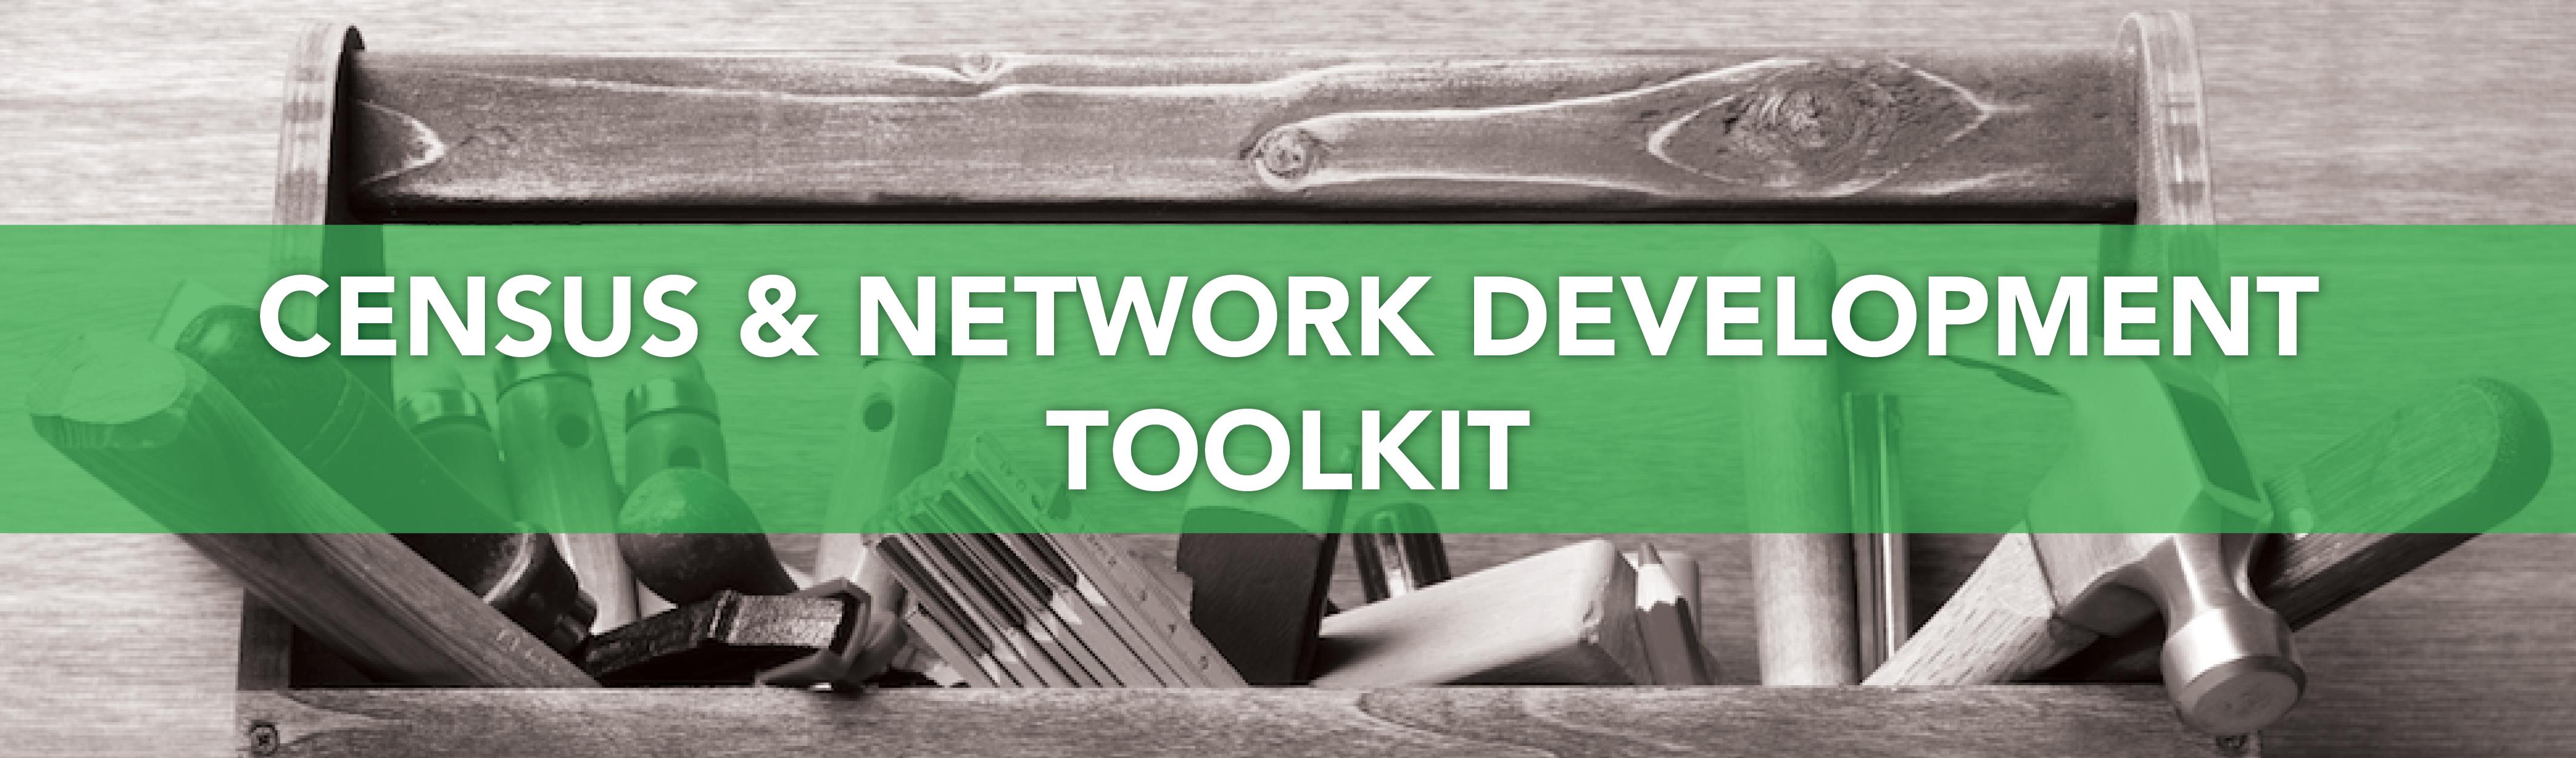 Census & Network Development Toolkit